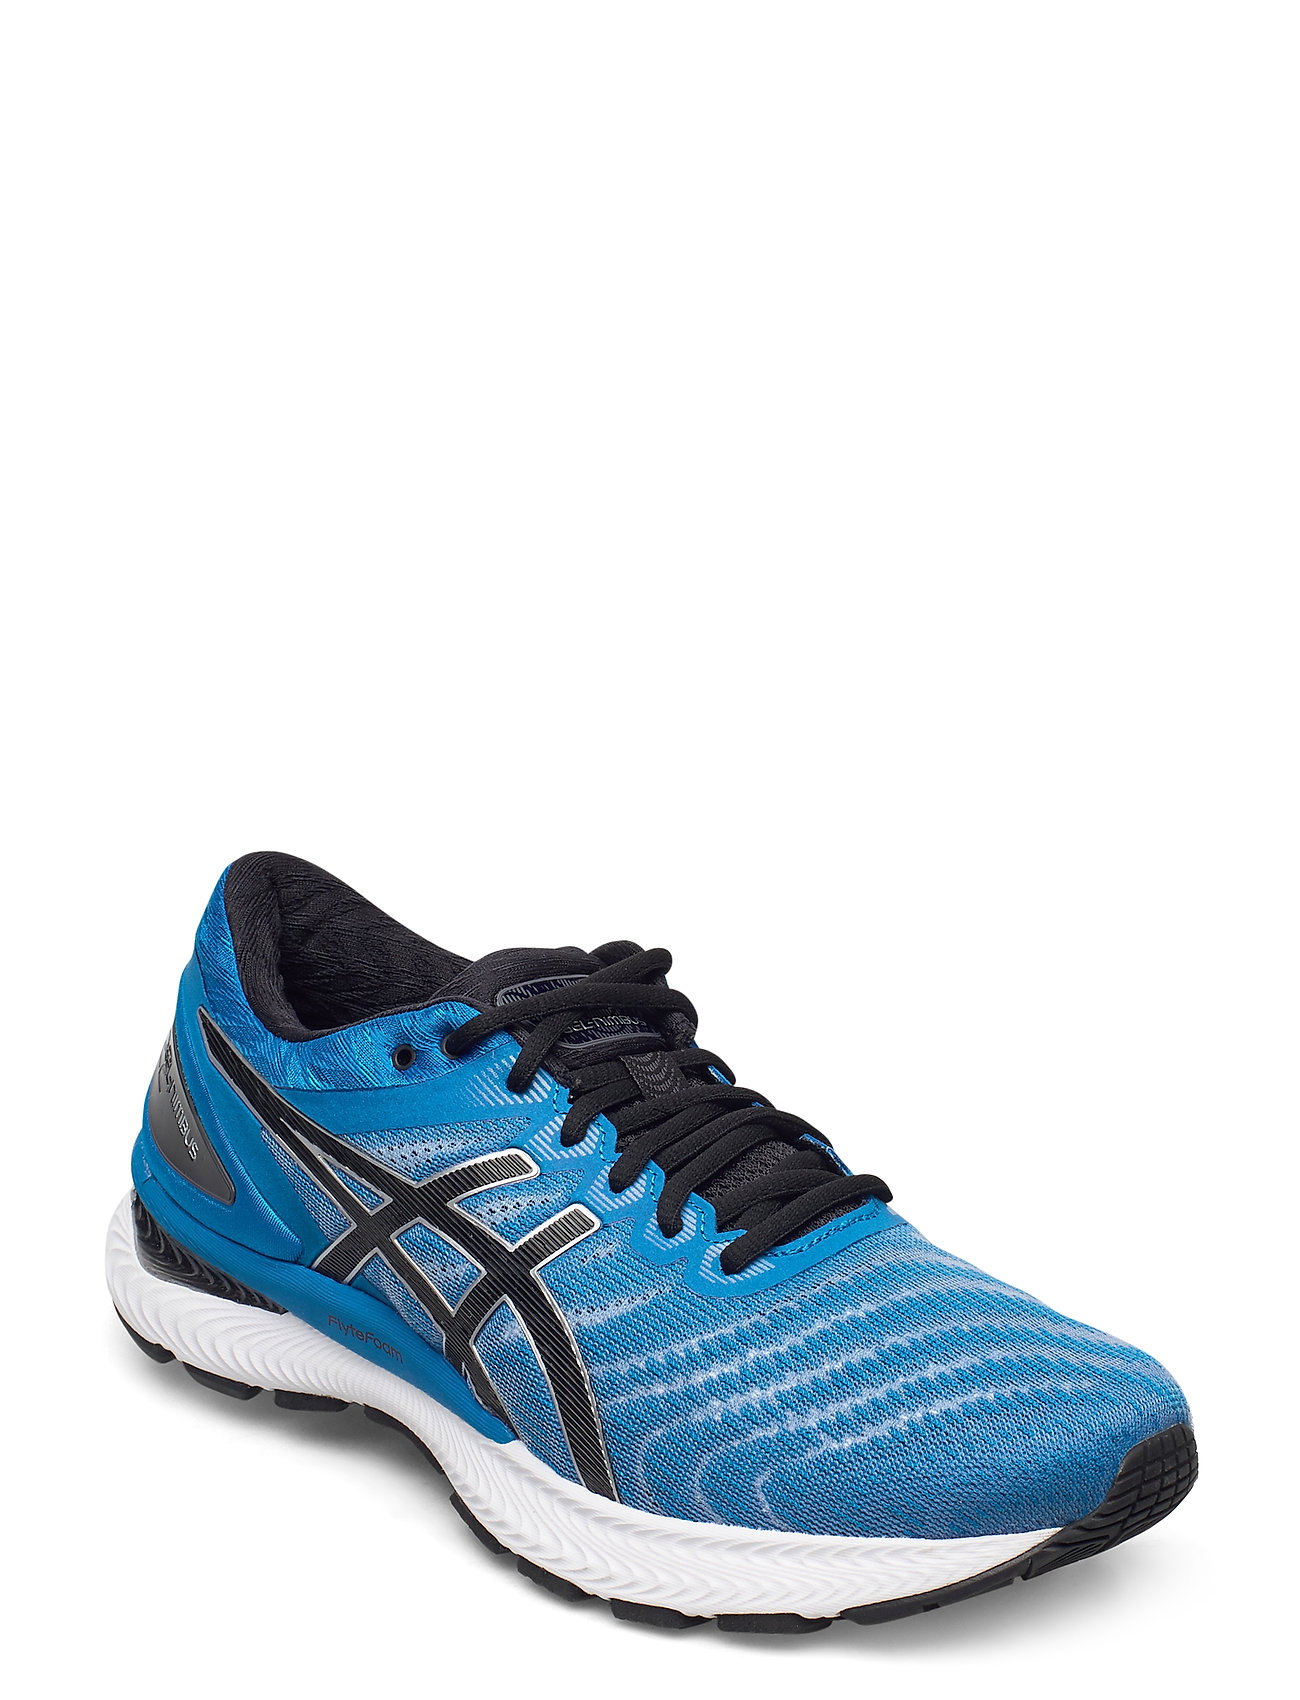 ASICS Sneaker | Gel-Nimbus 22 Shoes Sport Shoes Running Shoes Blau ASICS